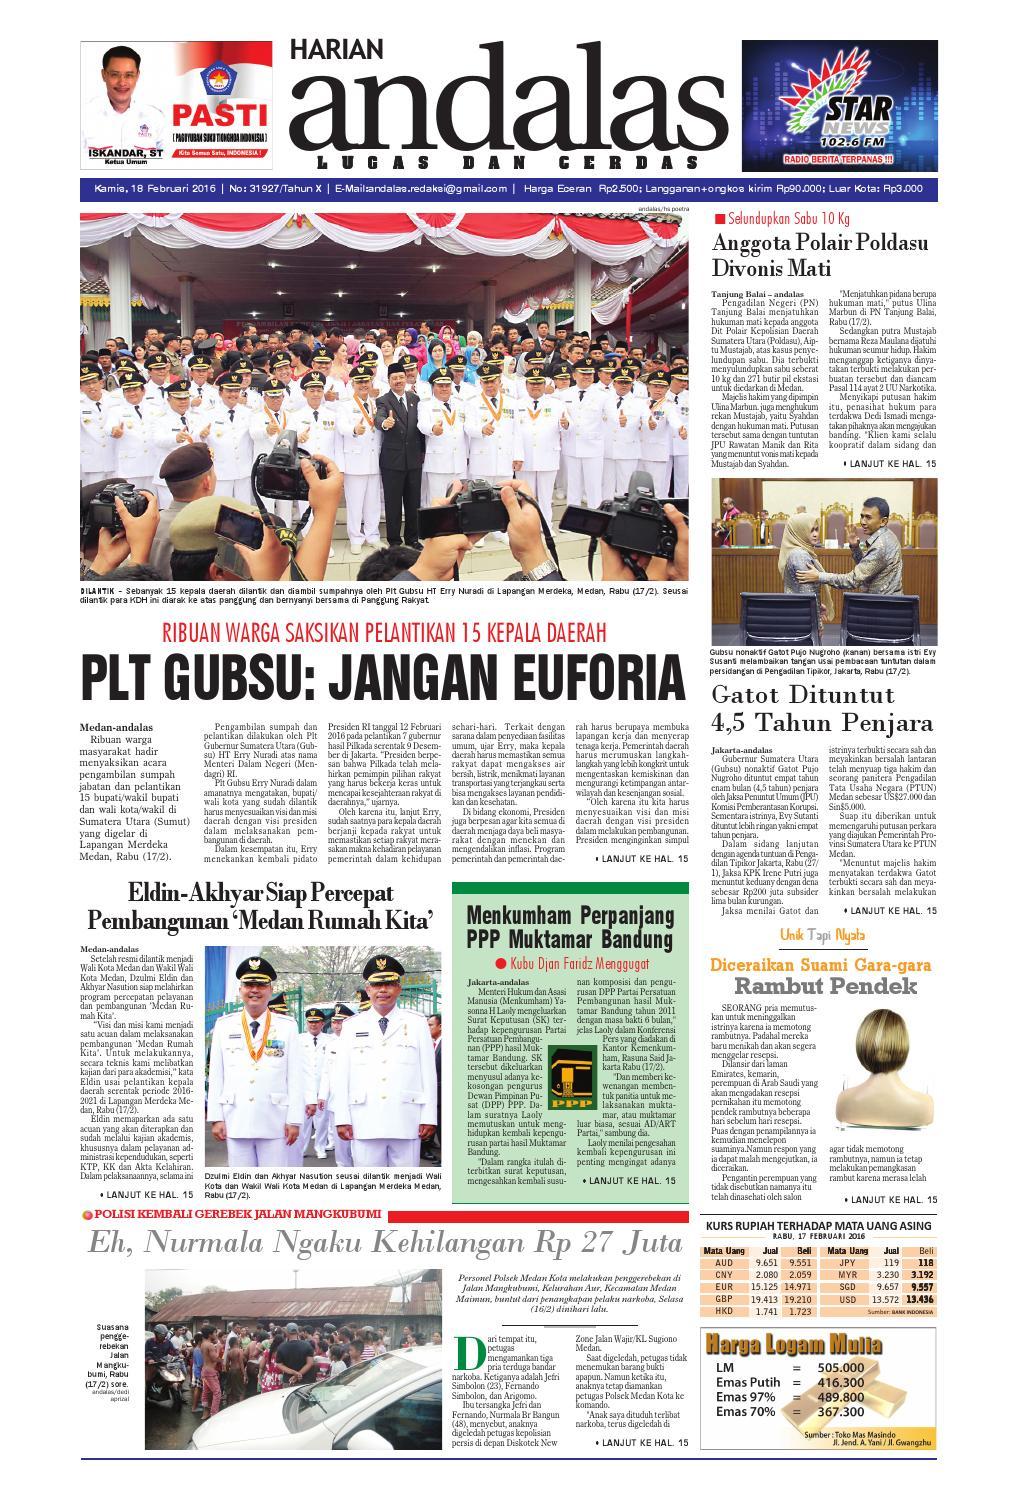 Epaper andalas edisi kamis 18 februari 2016 by media andalas - issuu f56ed93434